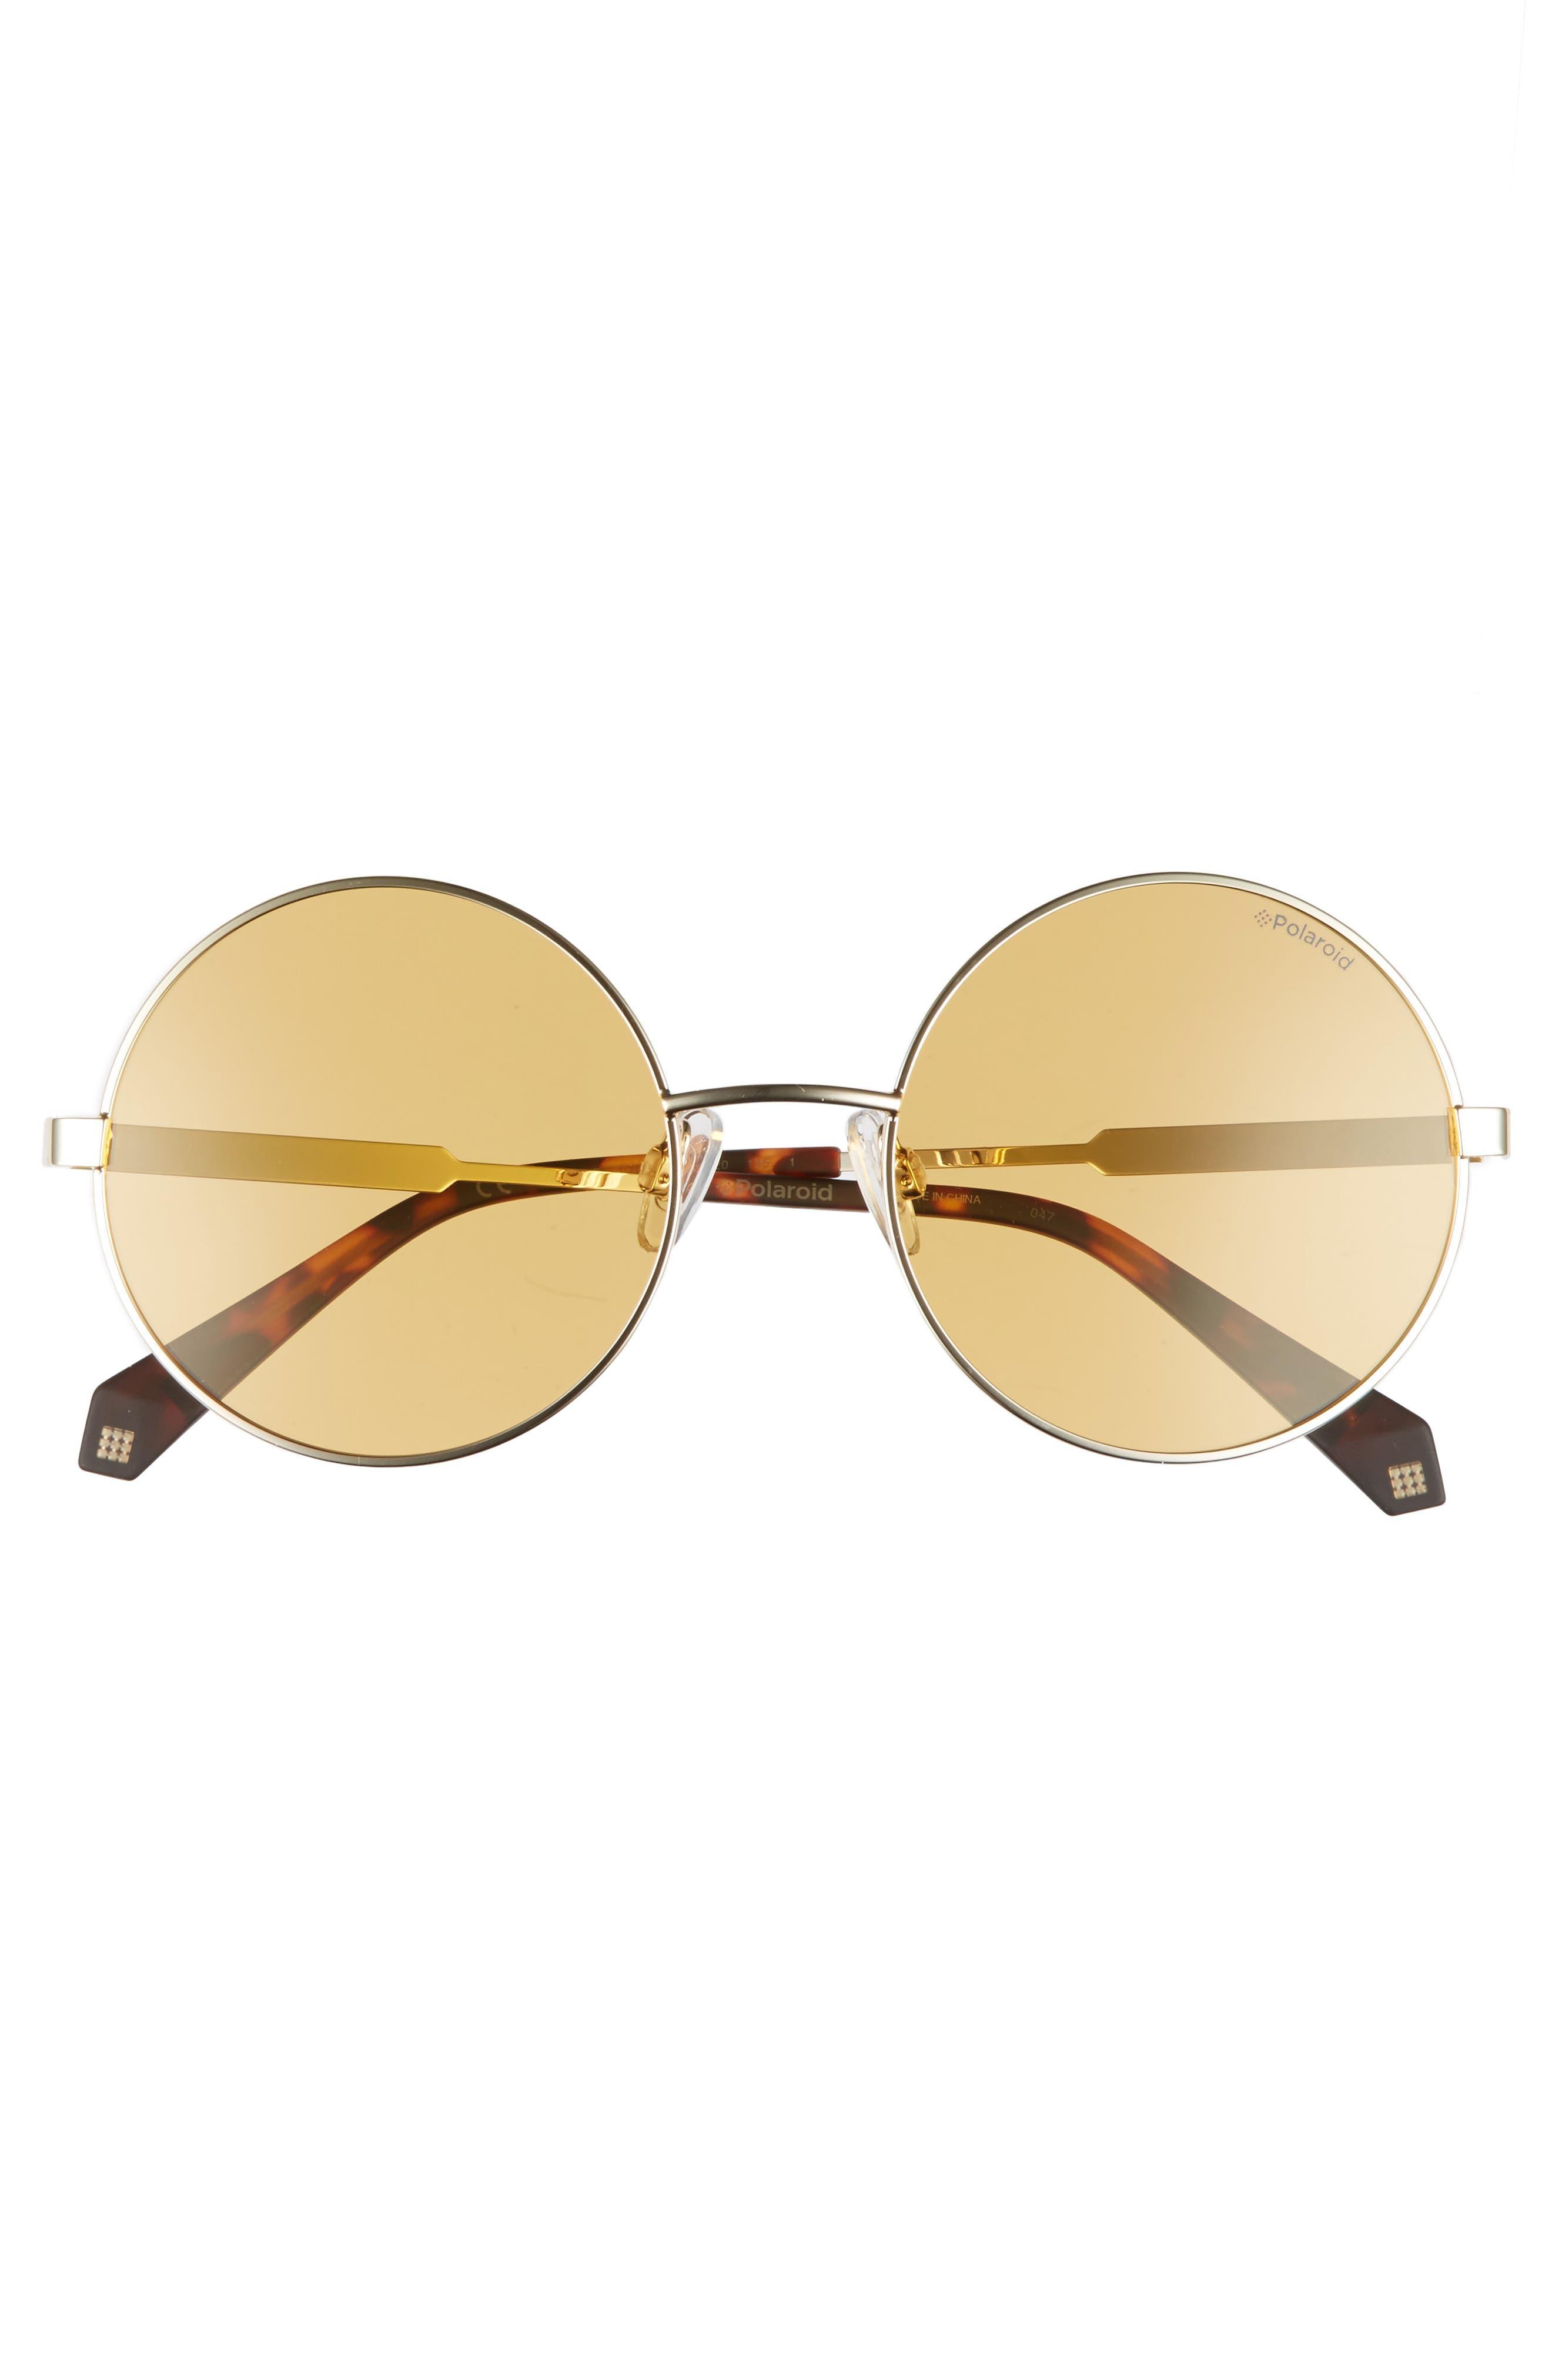 55mm Polarized Round Sunglasses,                             Alternate thumbnail 12, color,